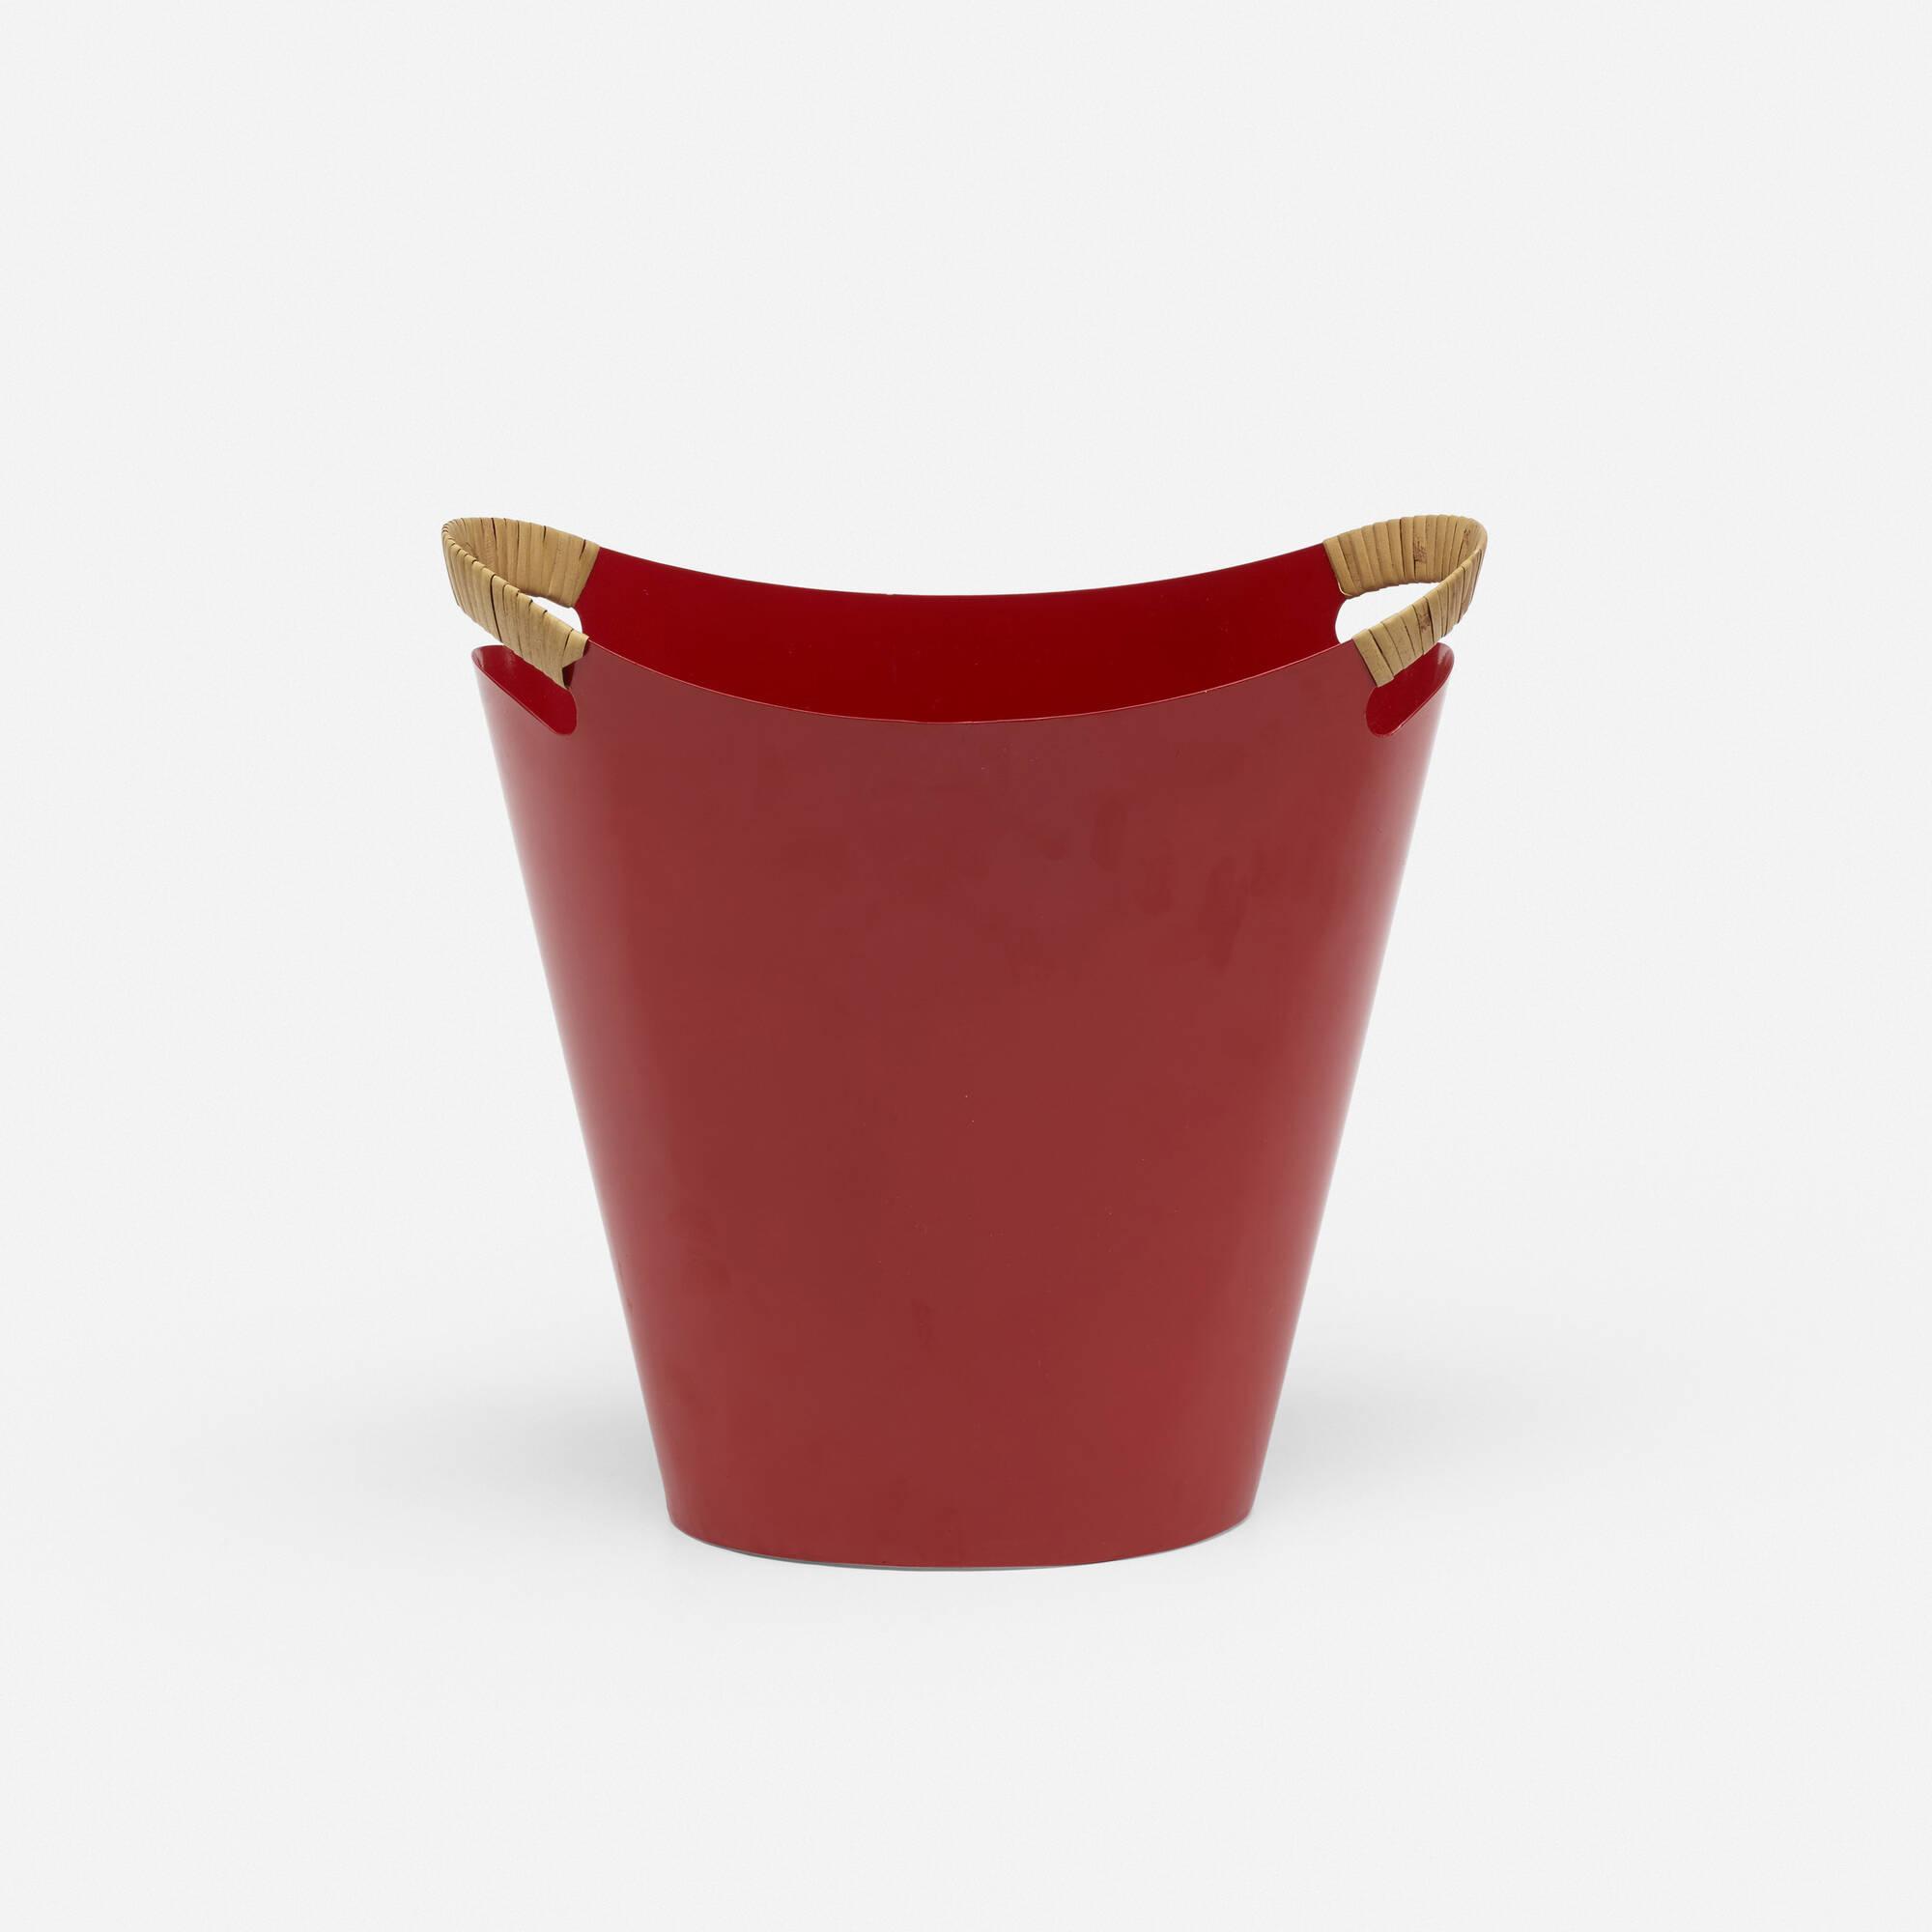 145: Grethe Bang and Finn Juhl / wastepaper basket (2 of 3)